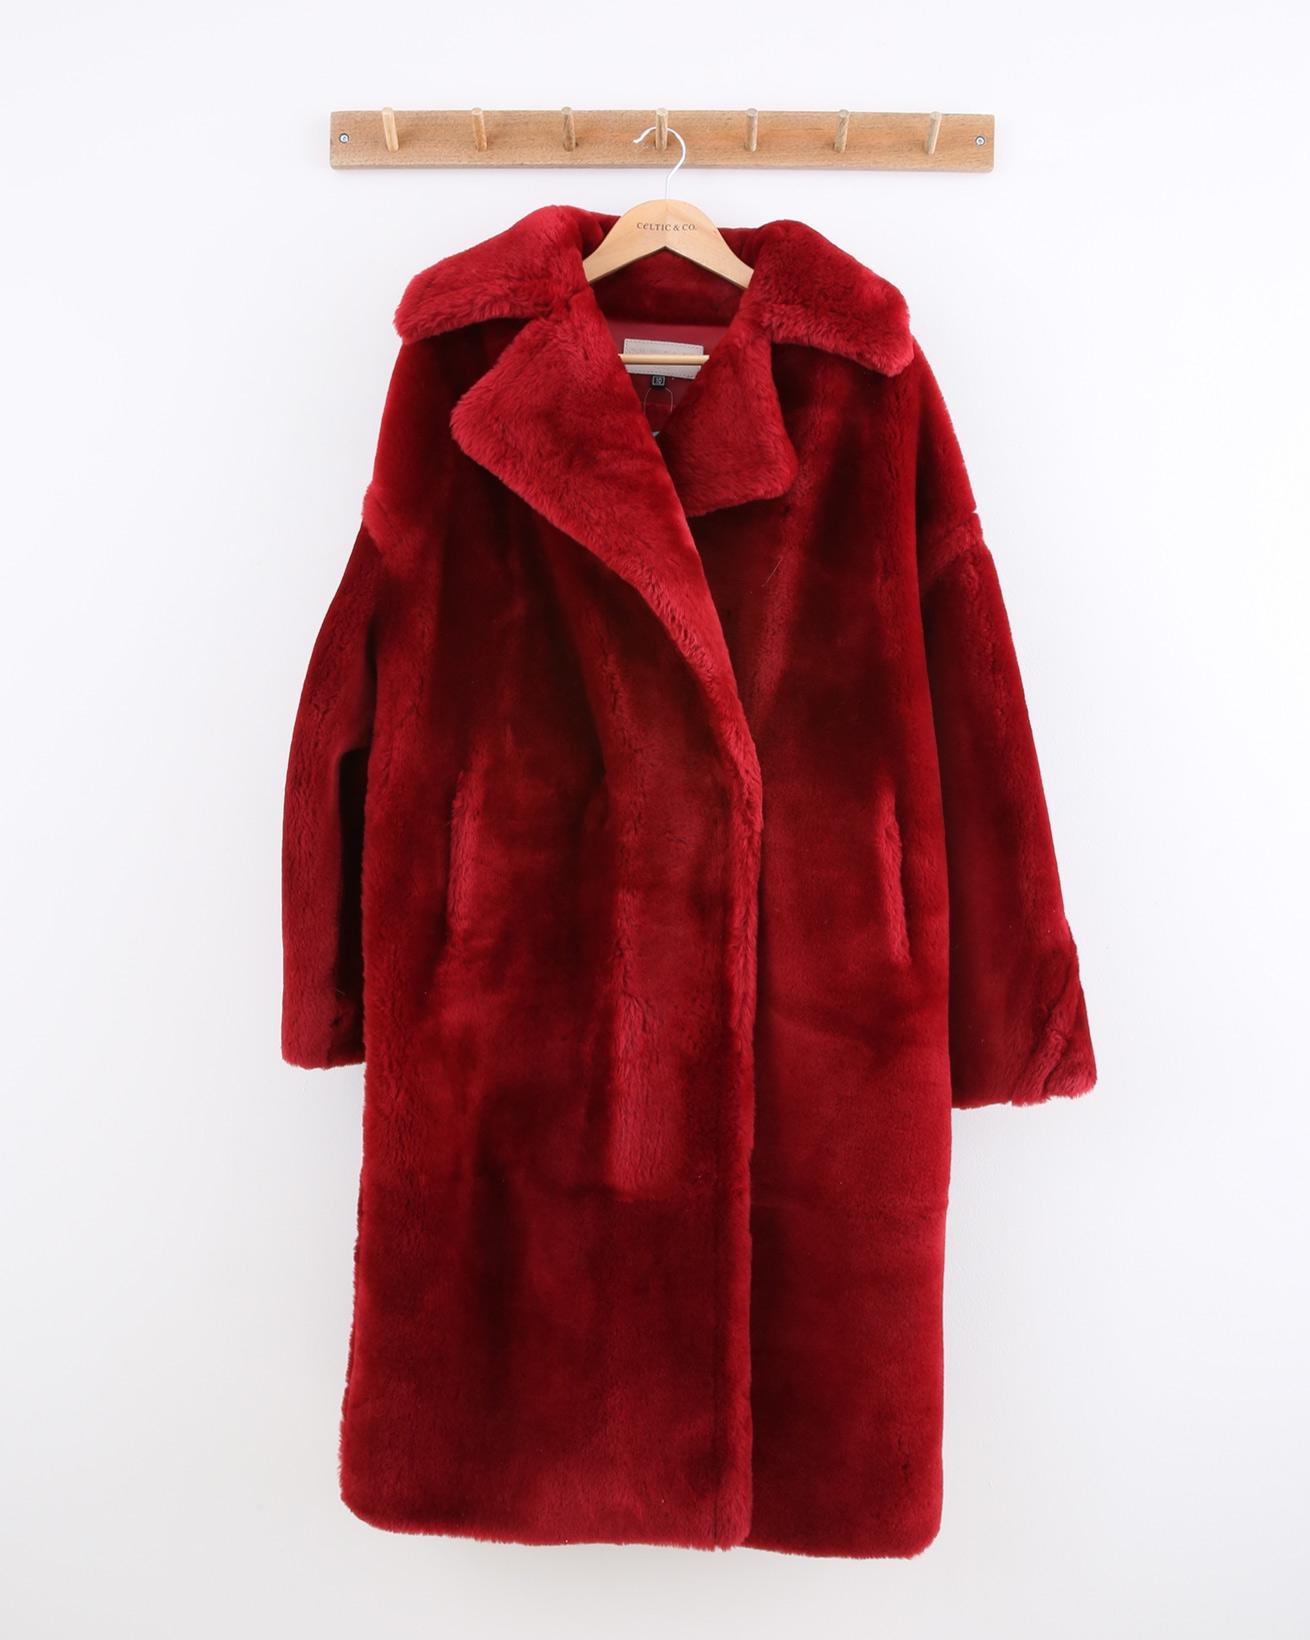 Oversized Long Sheepskin Overcoat - Size 10 - Pillarbox Red - 1472